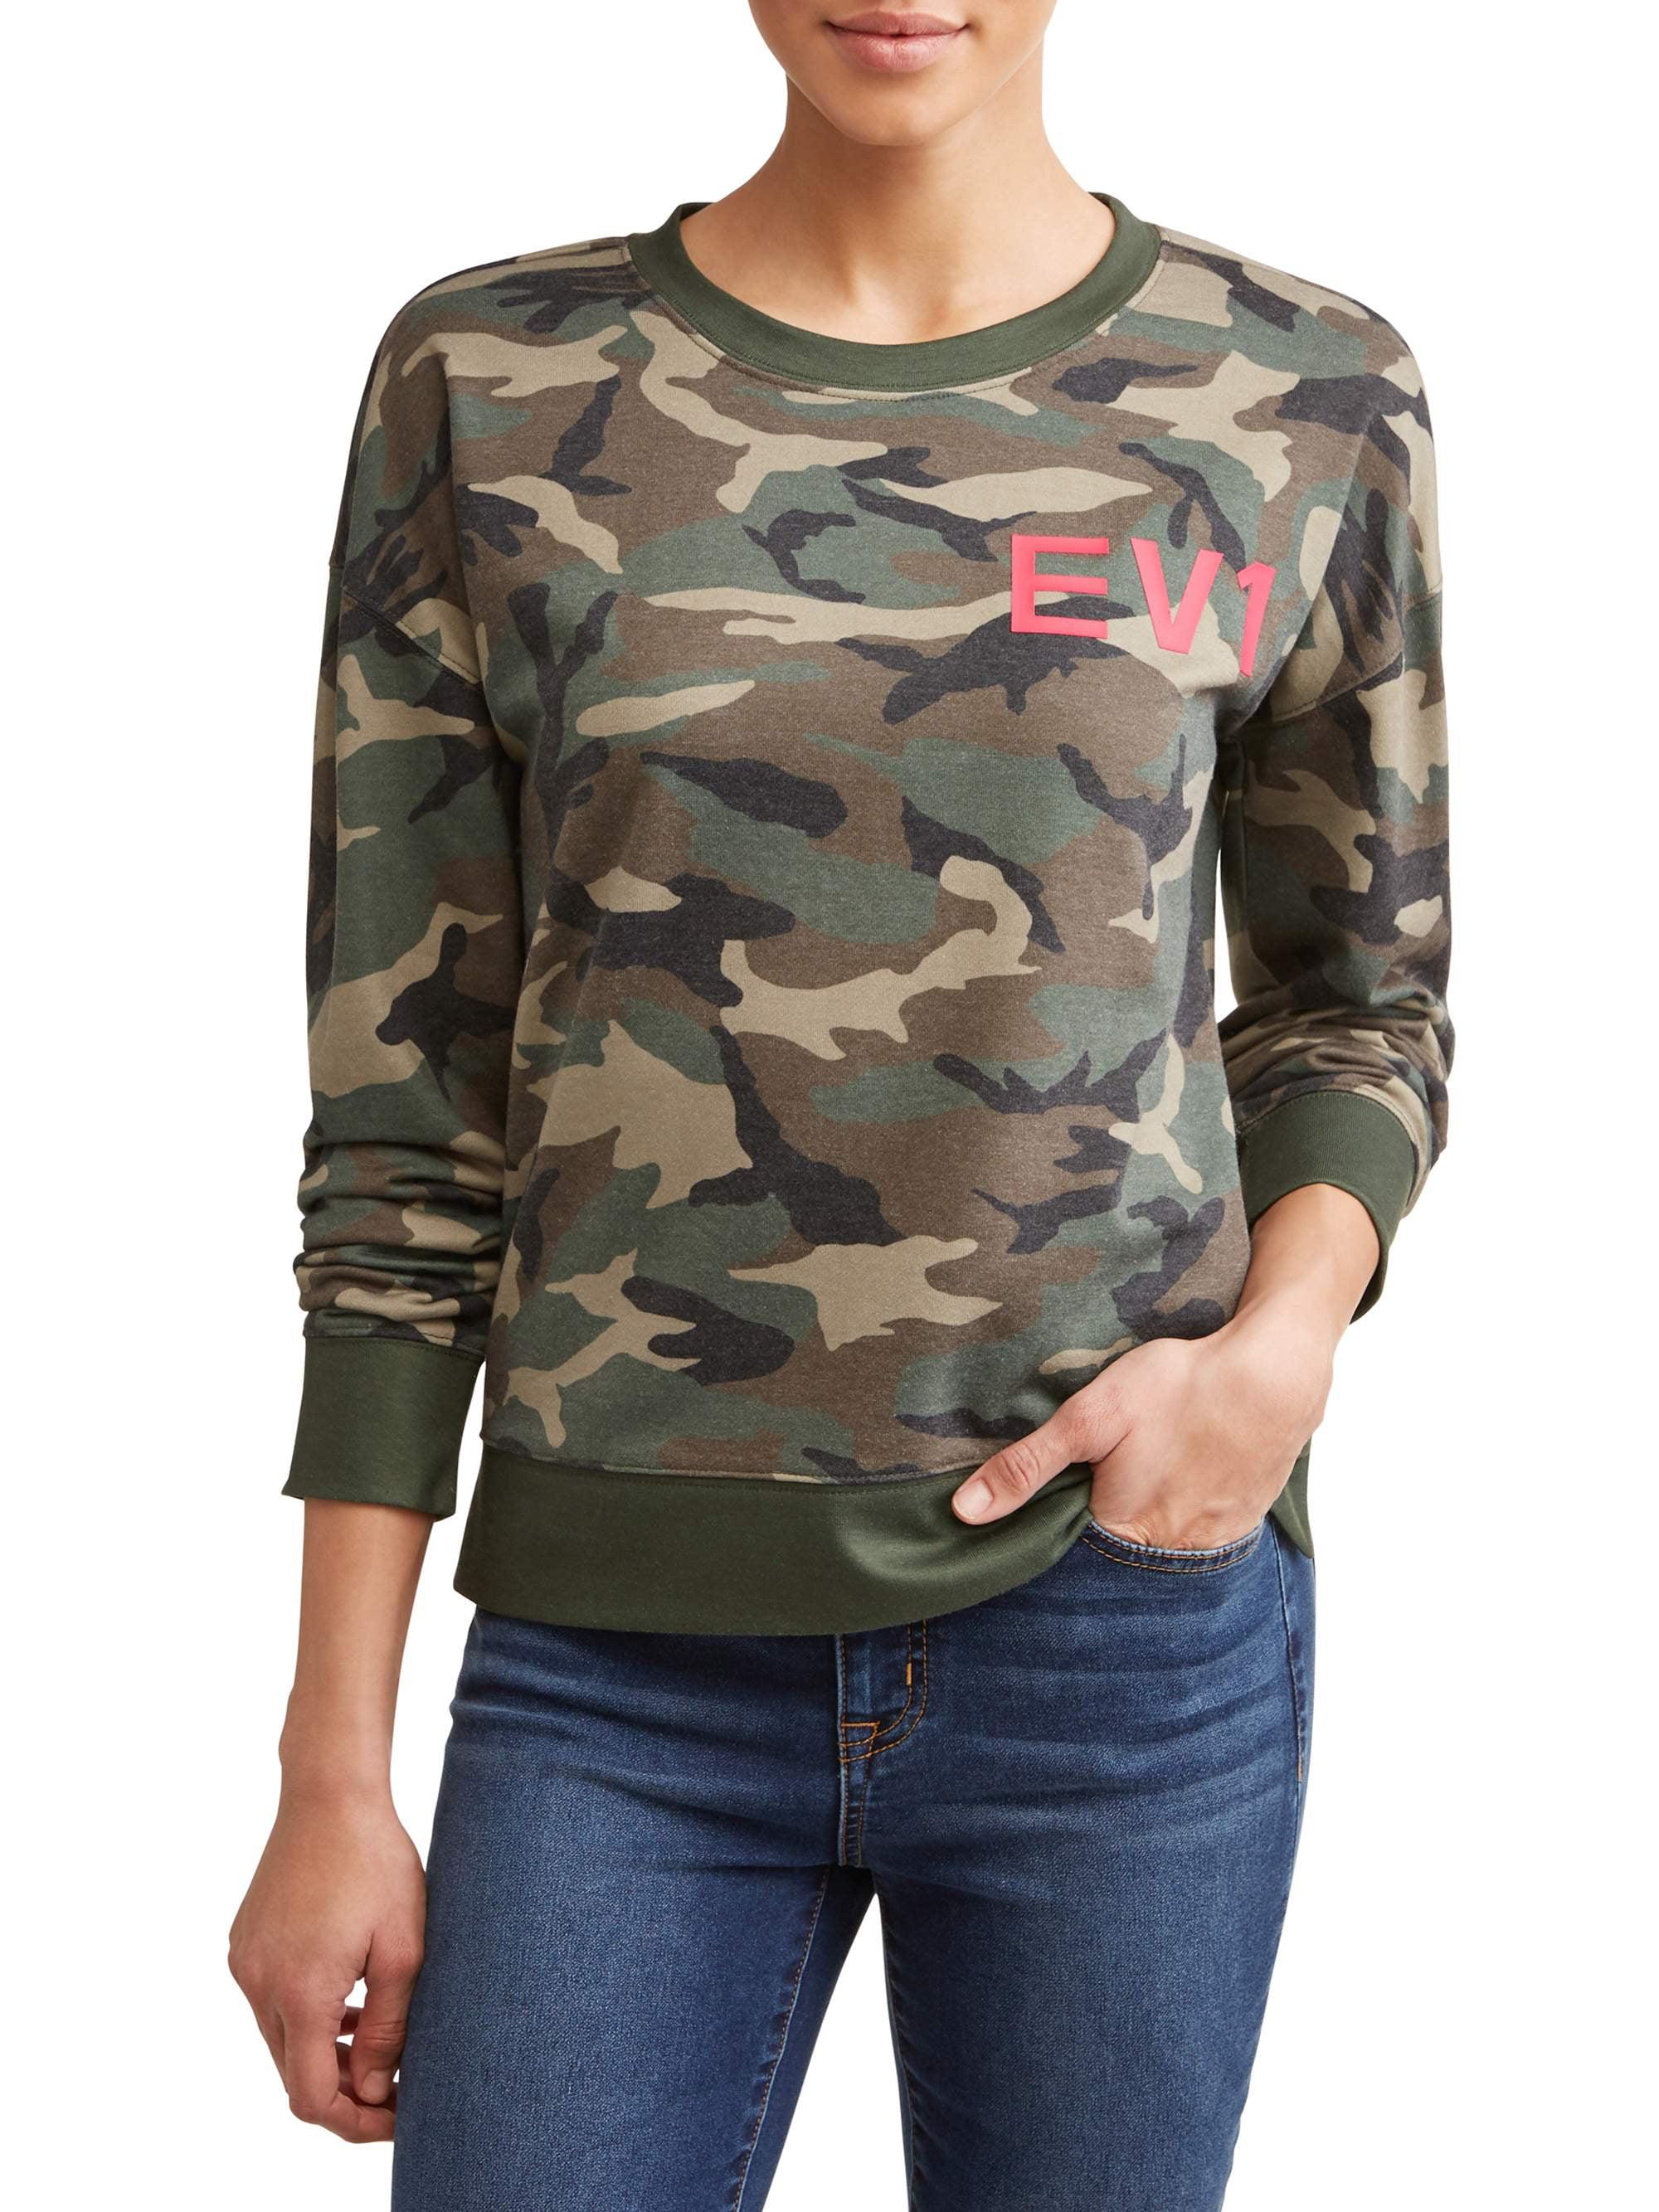 Camo Printed Crewneck Sweatshirt Women's